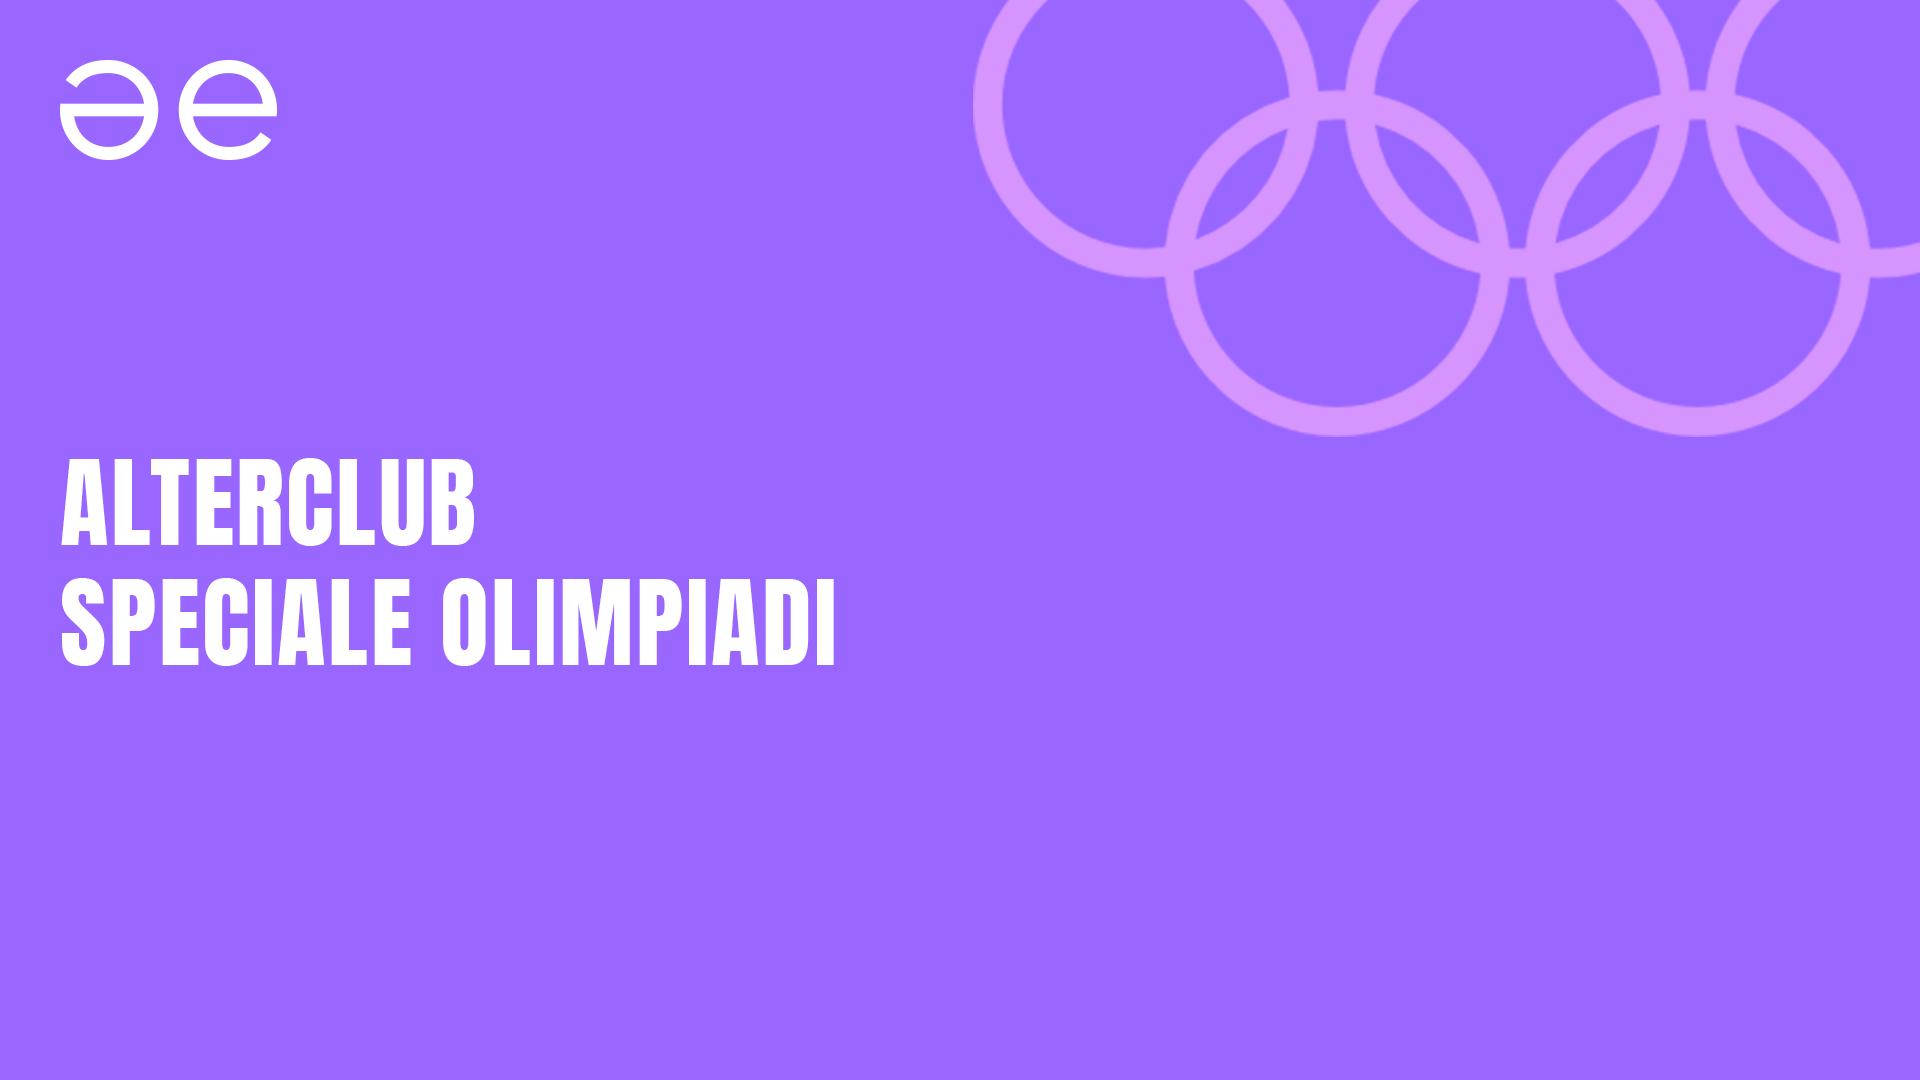 copertina alterclub olimpiadi